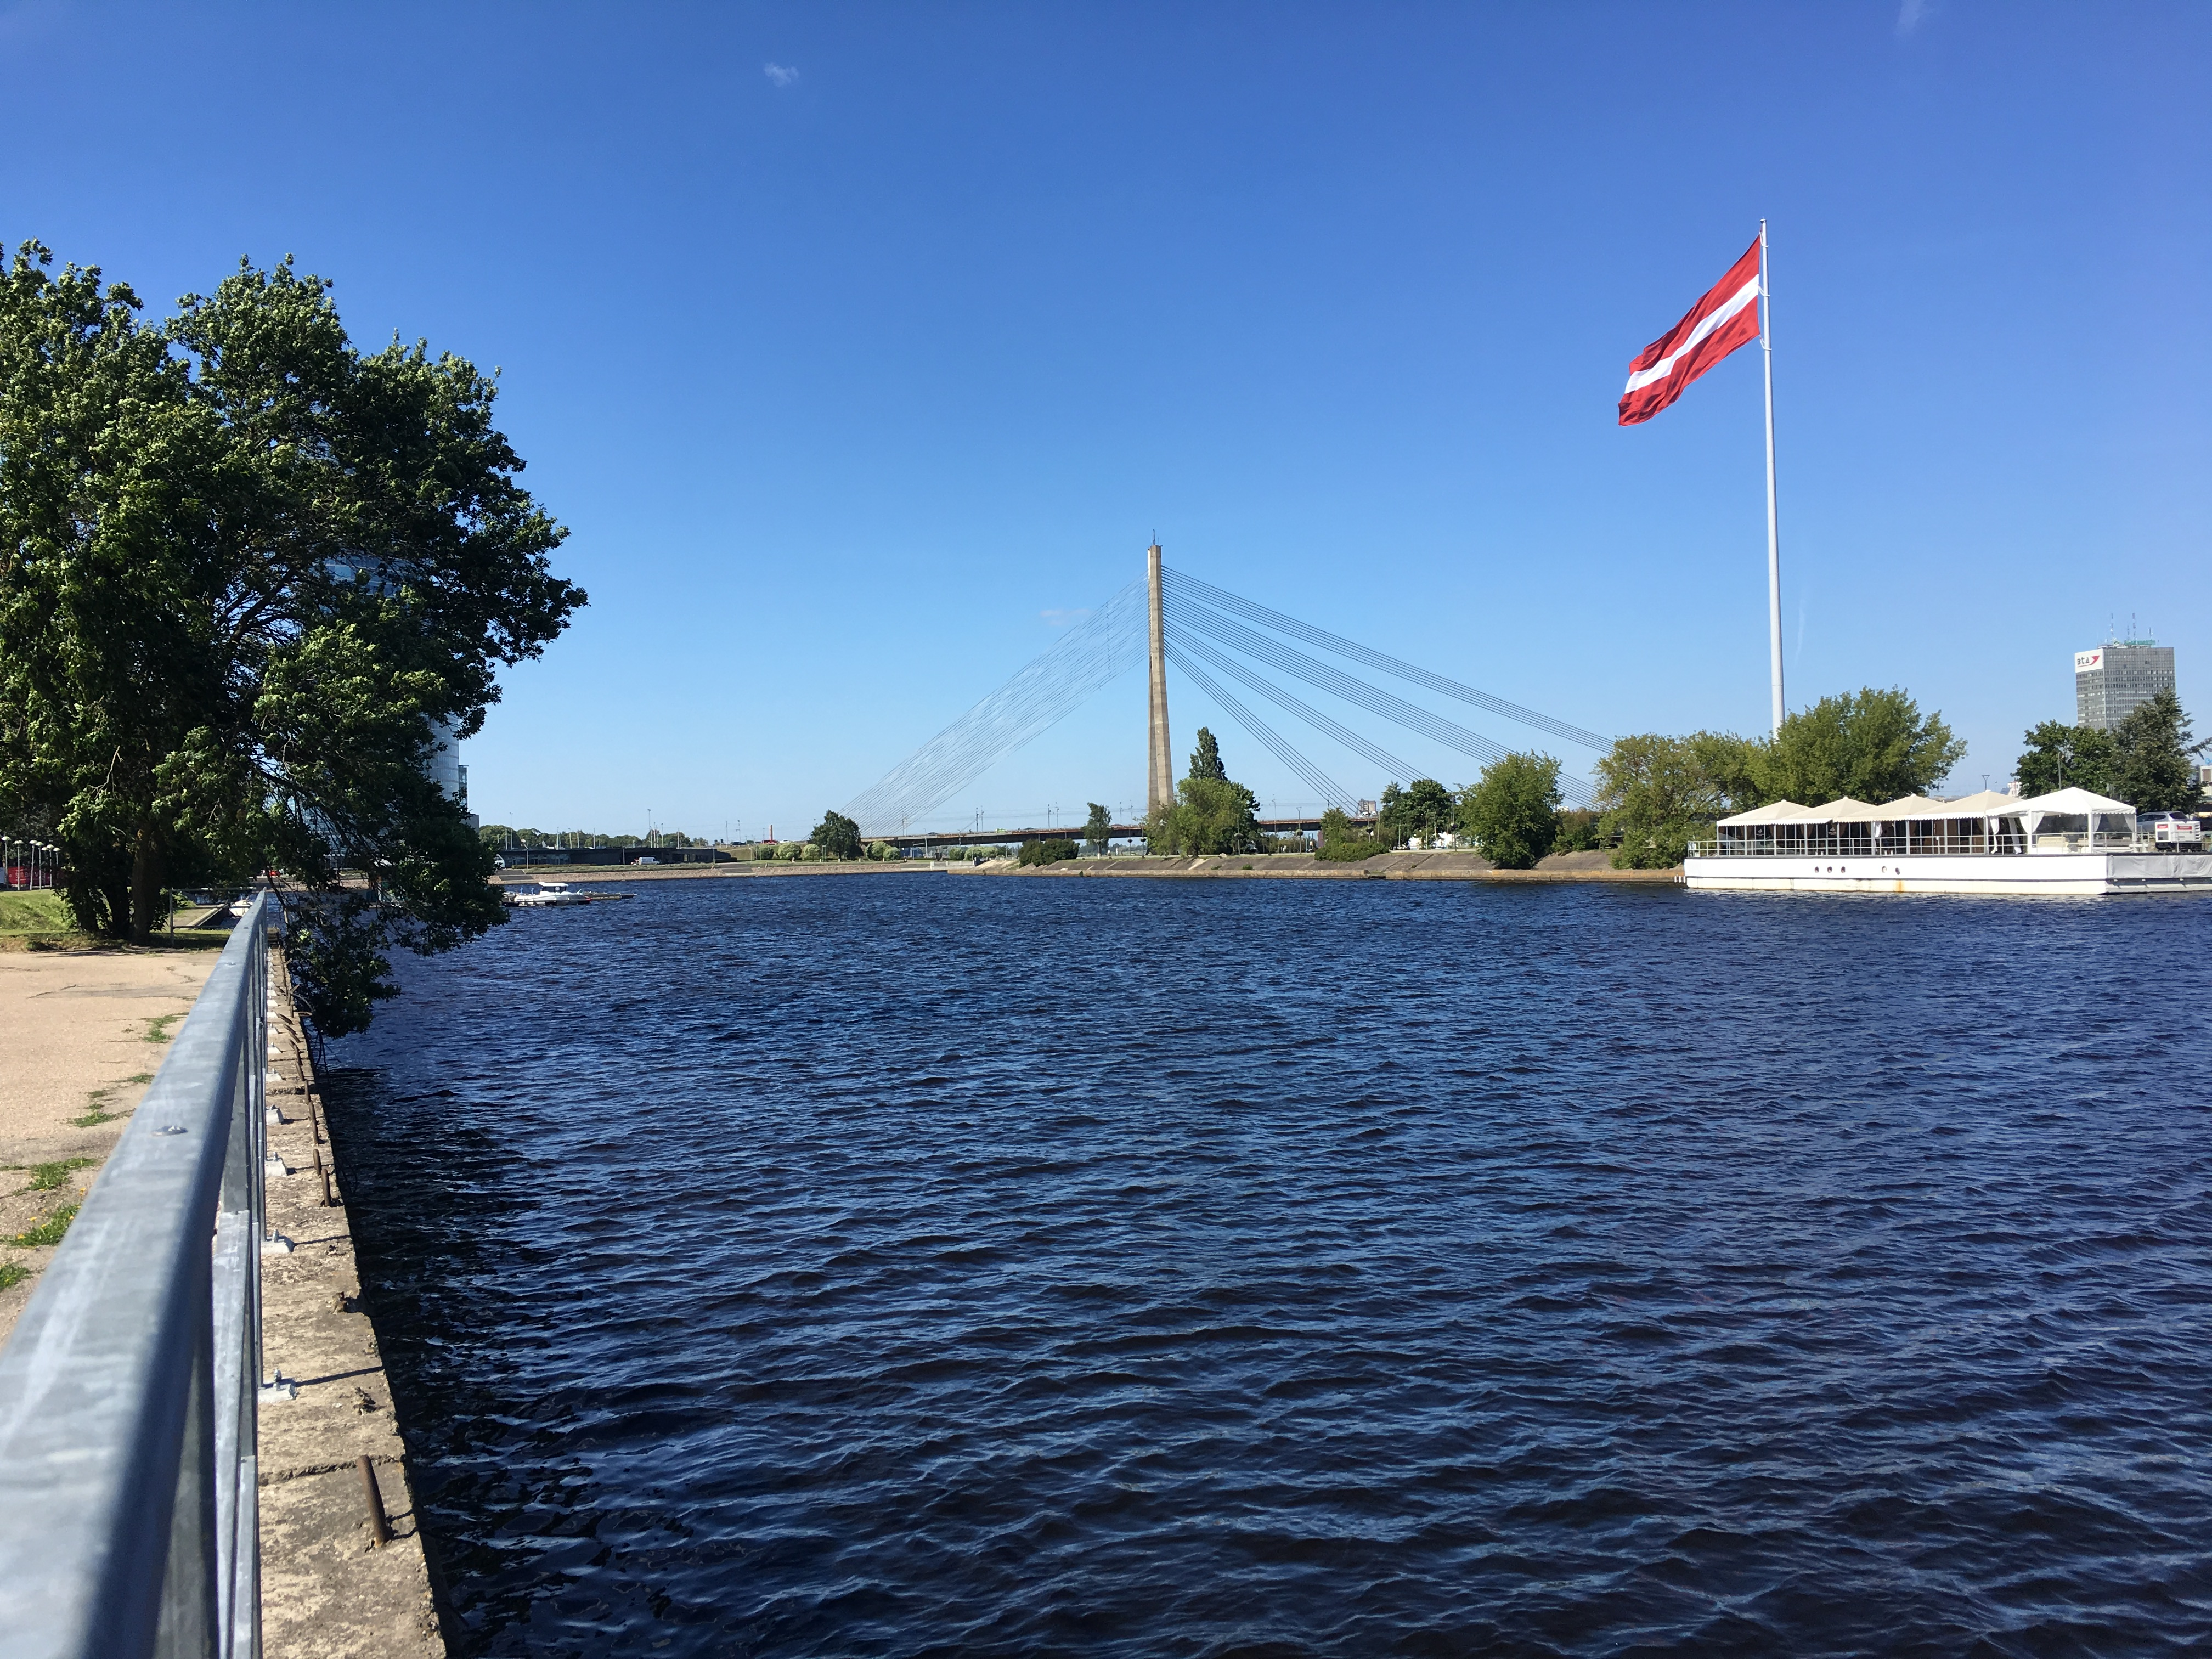 Zomerfoto Rigabrug Lennart Wildeboer